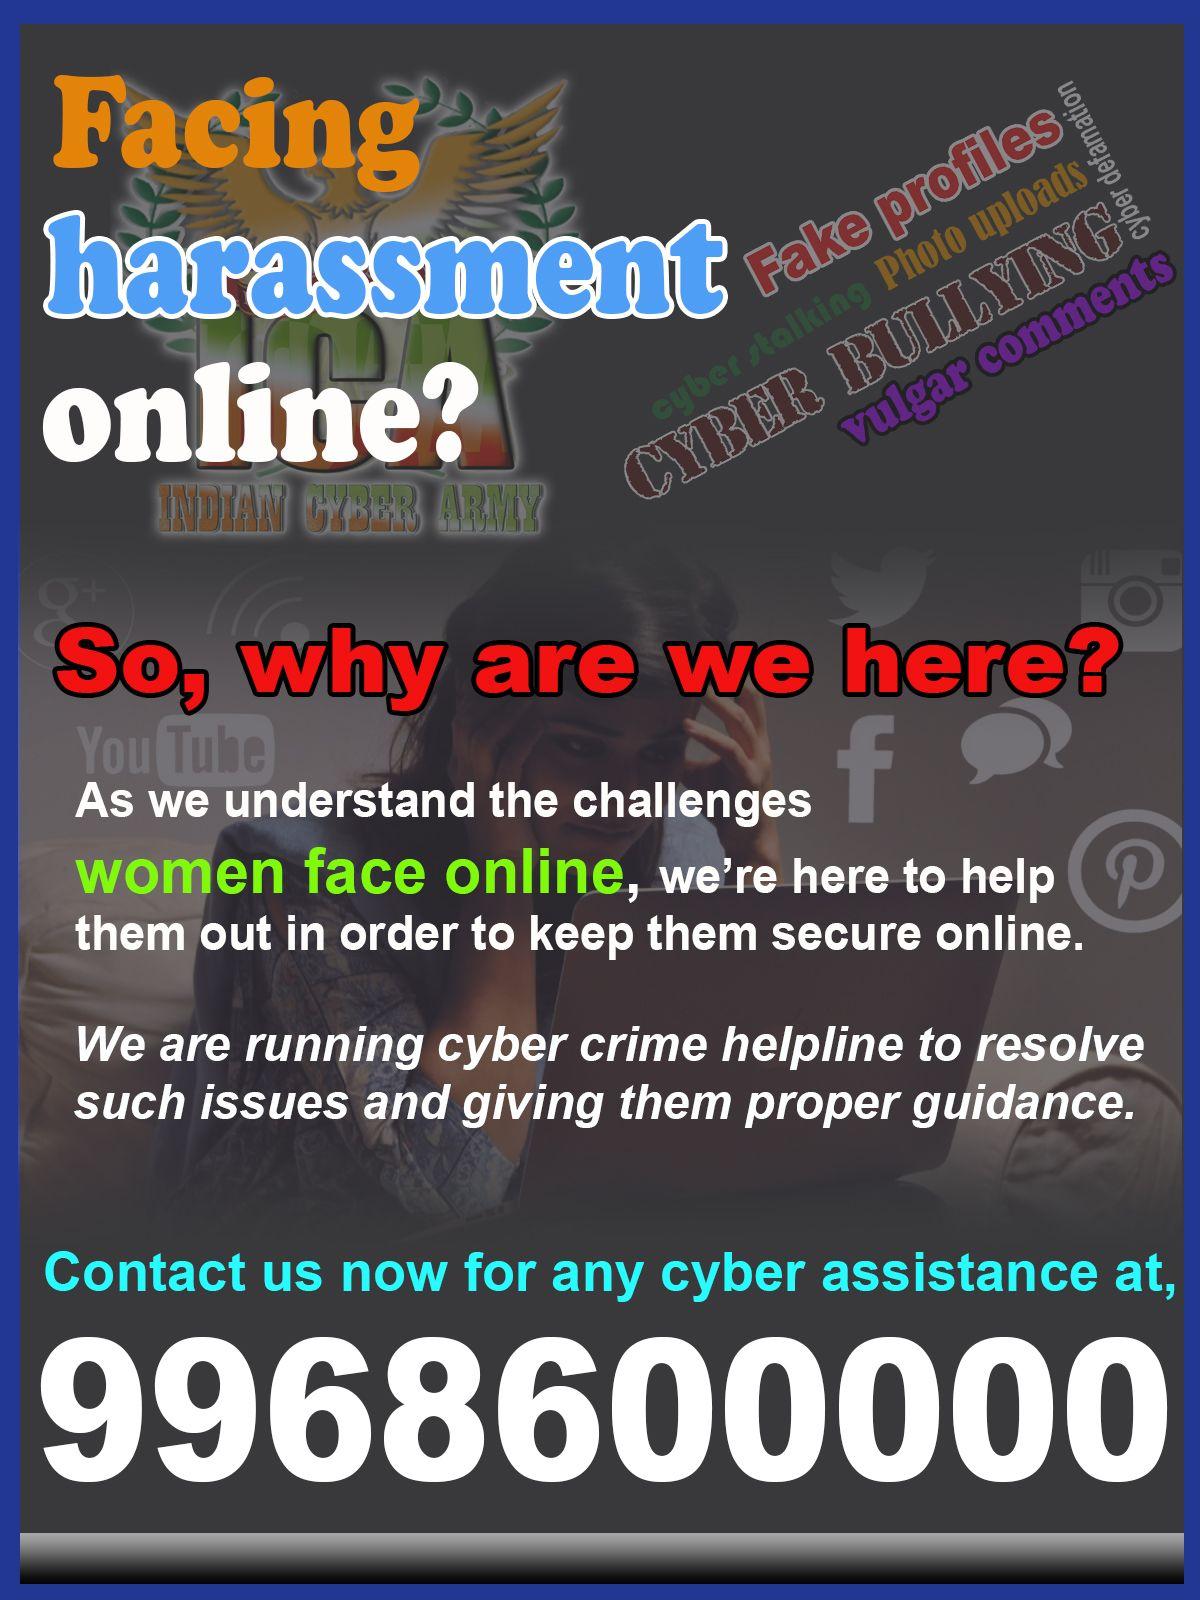 Cyber Crime Helpline Number Report A Complaint Online